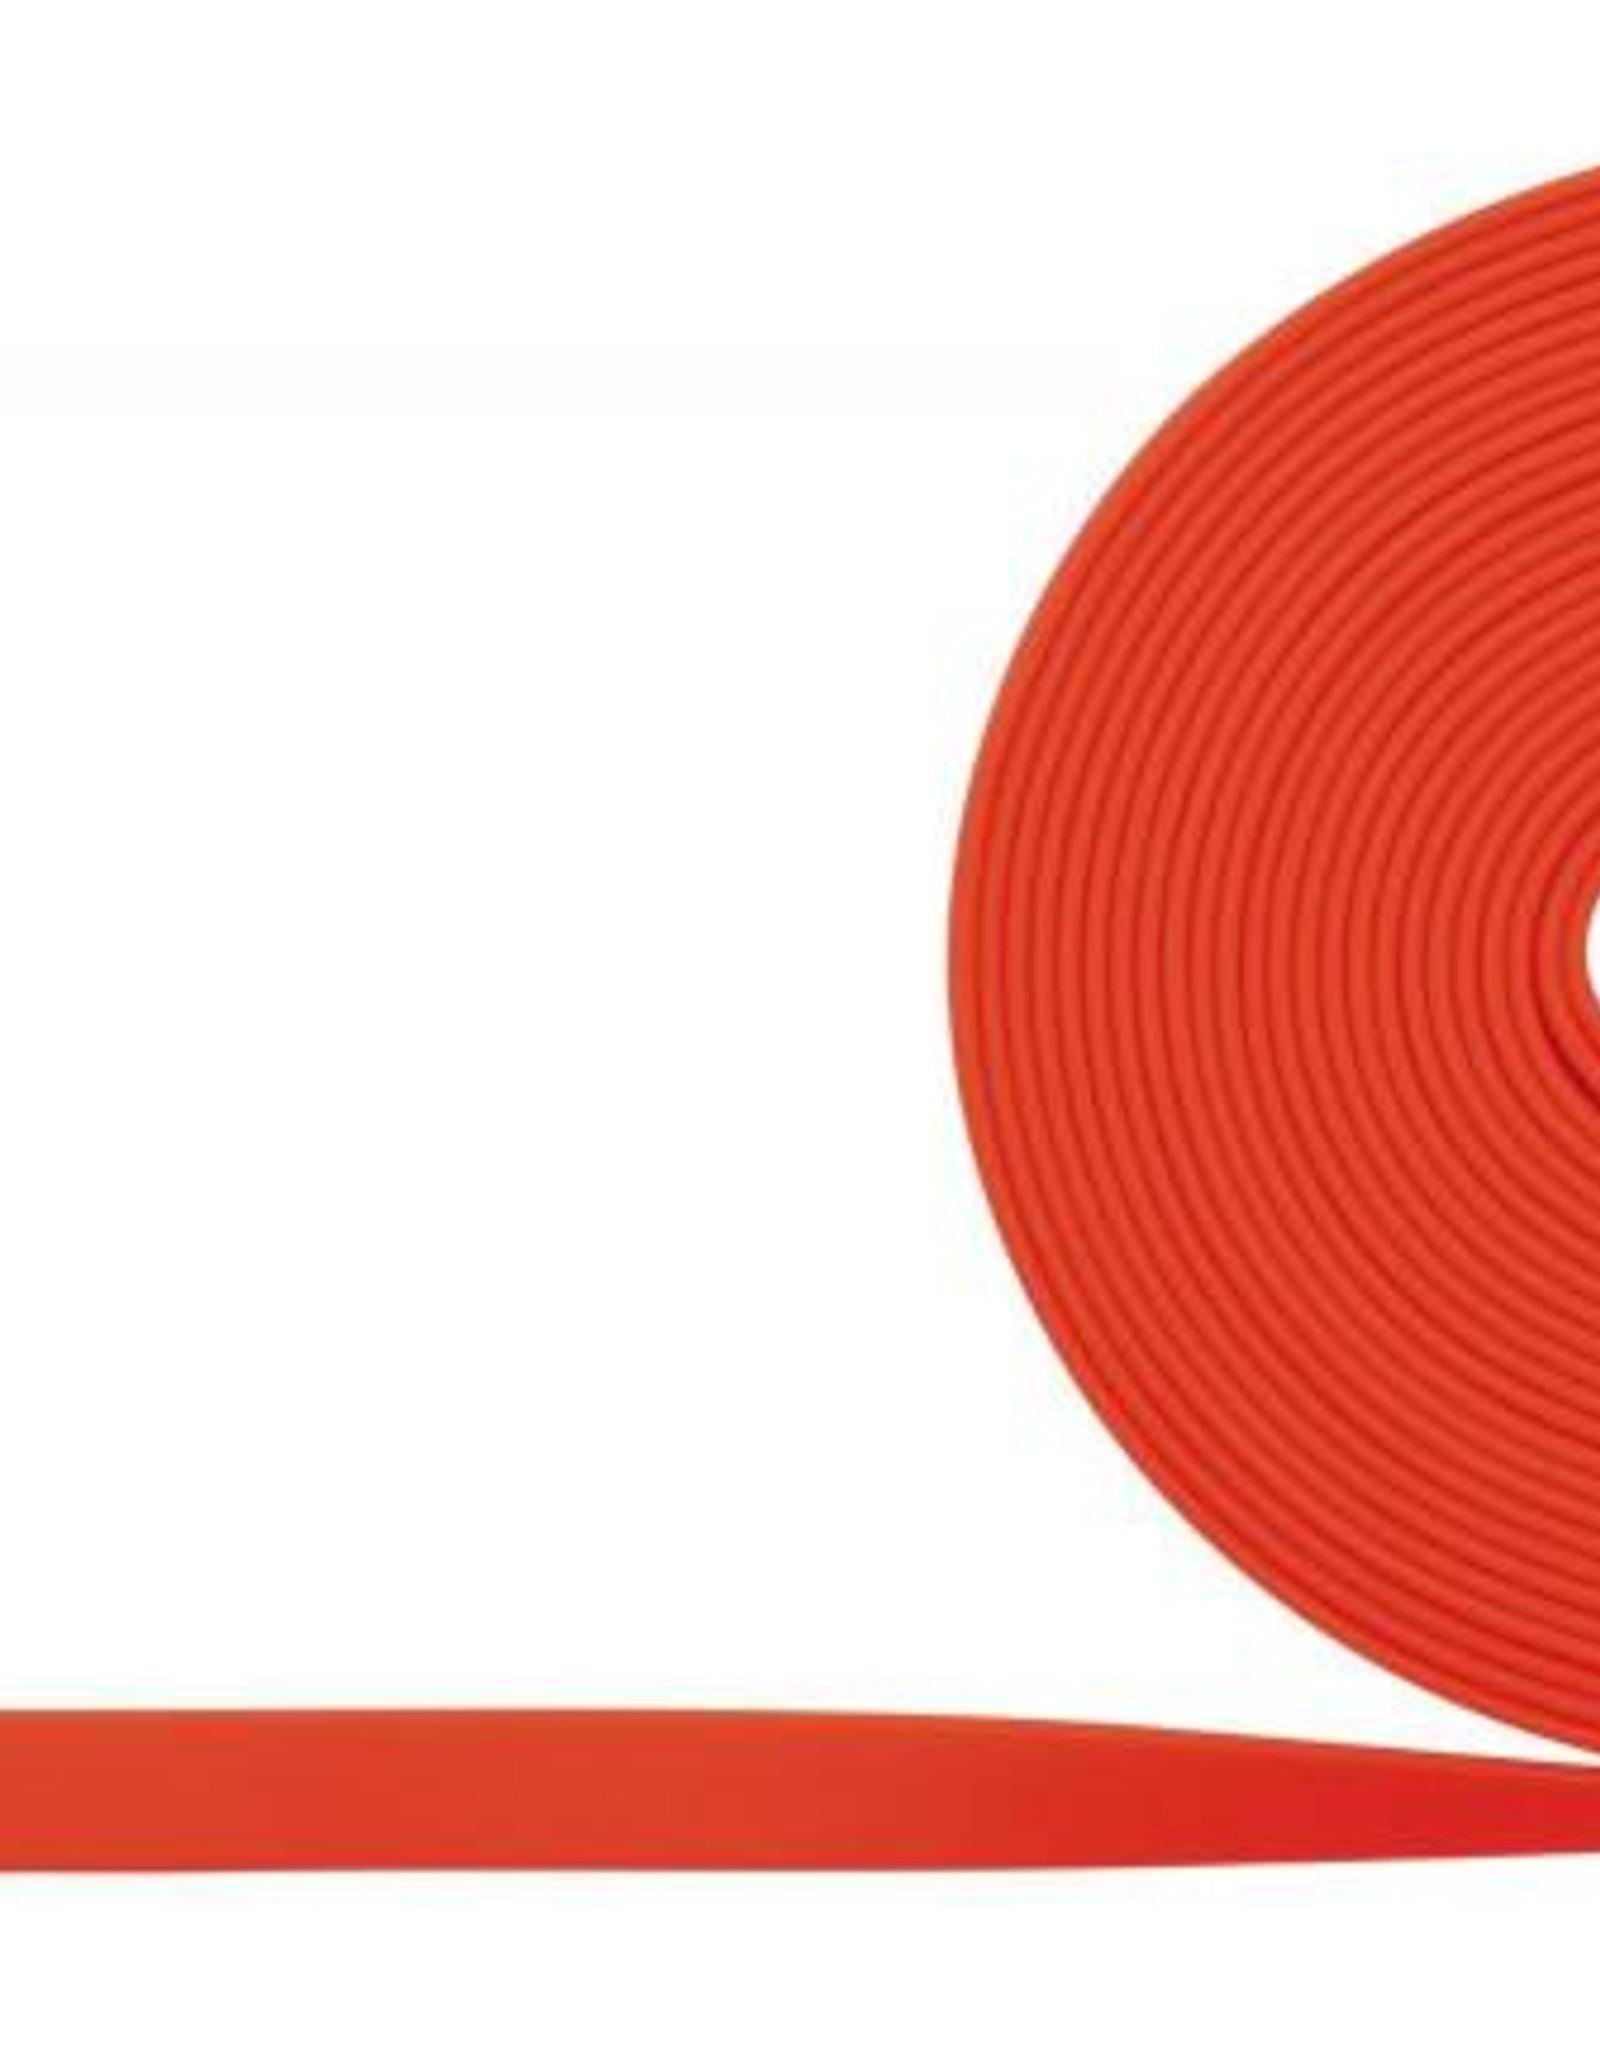 Trixie Easy Life Tracking Lead, Neon Orange 10m x 17mm